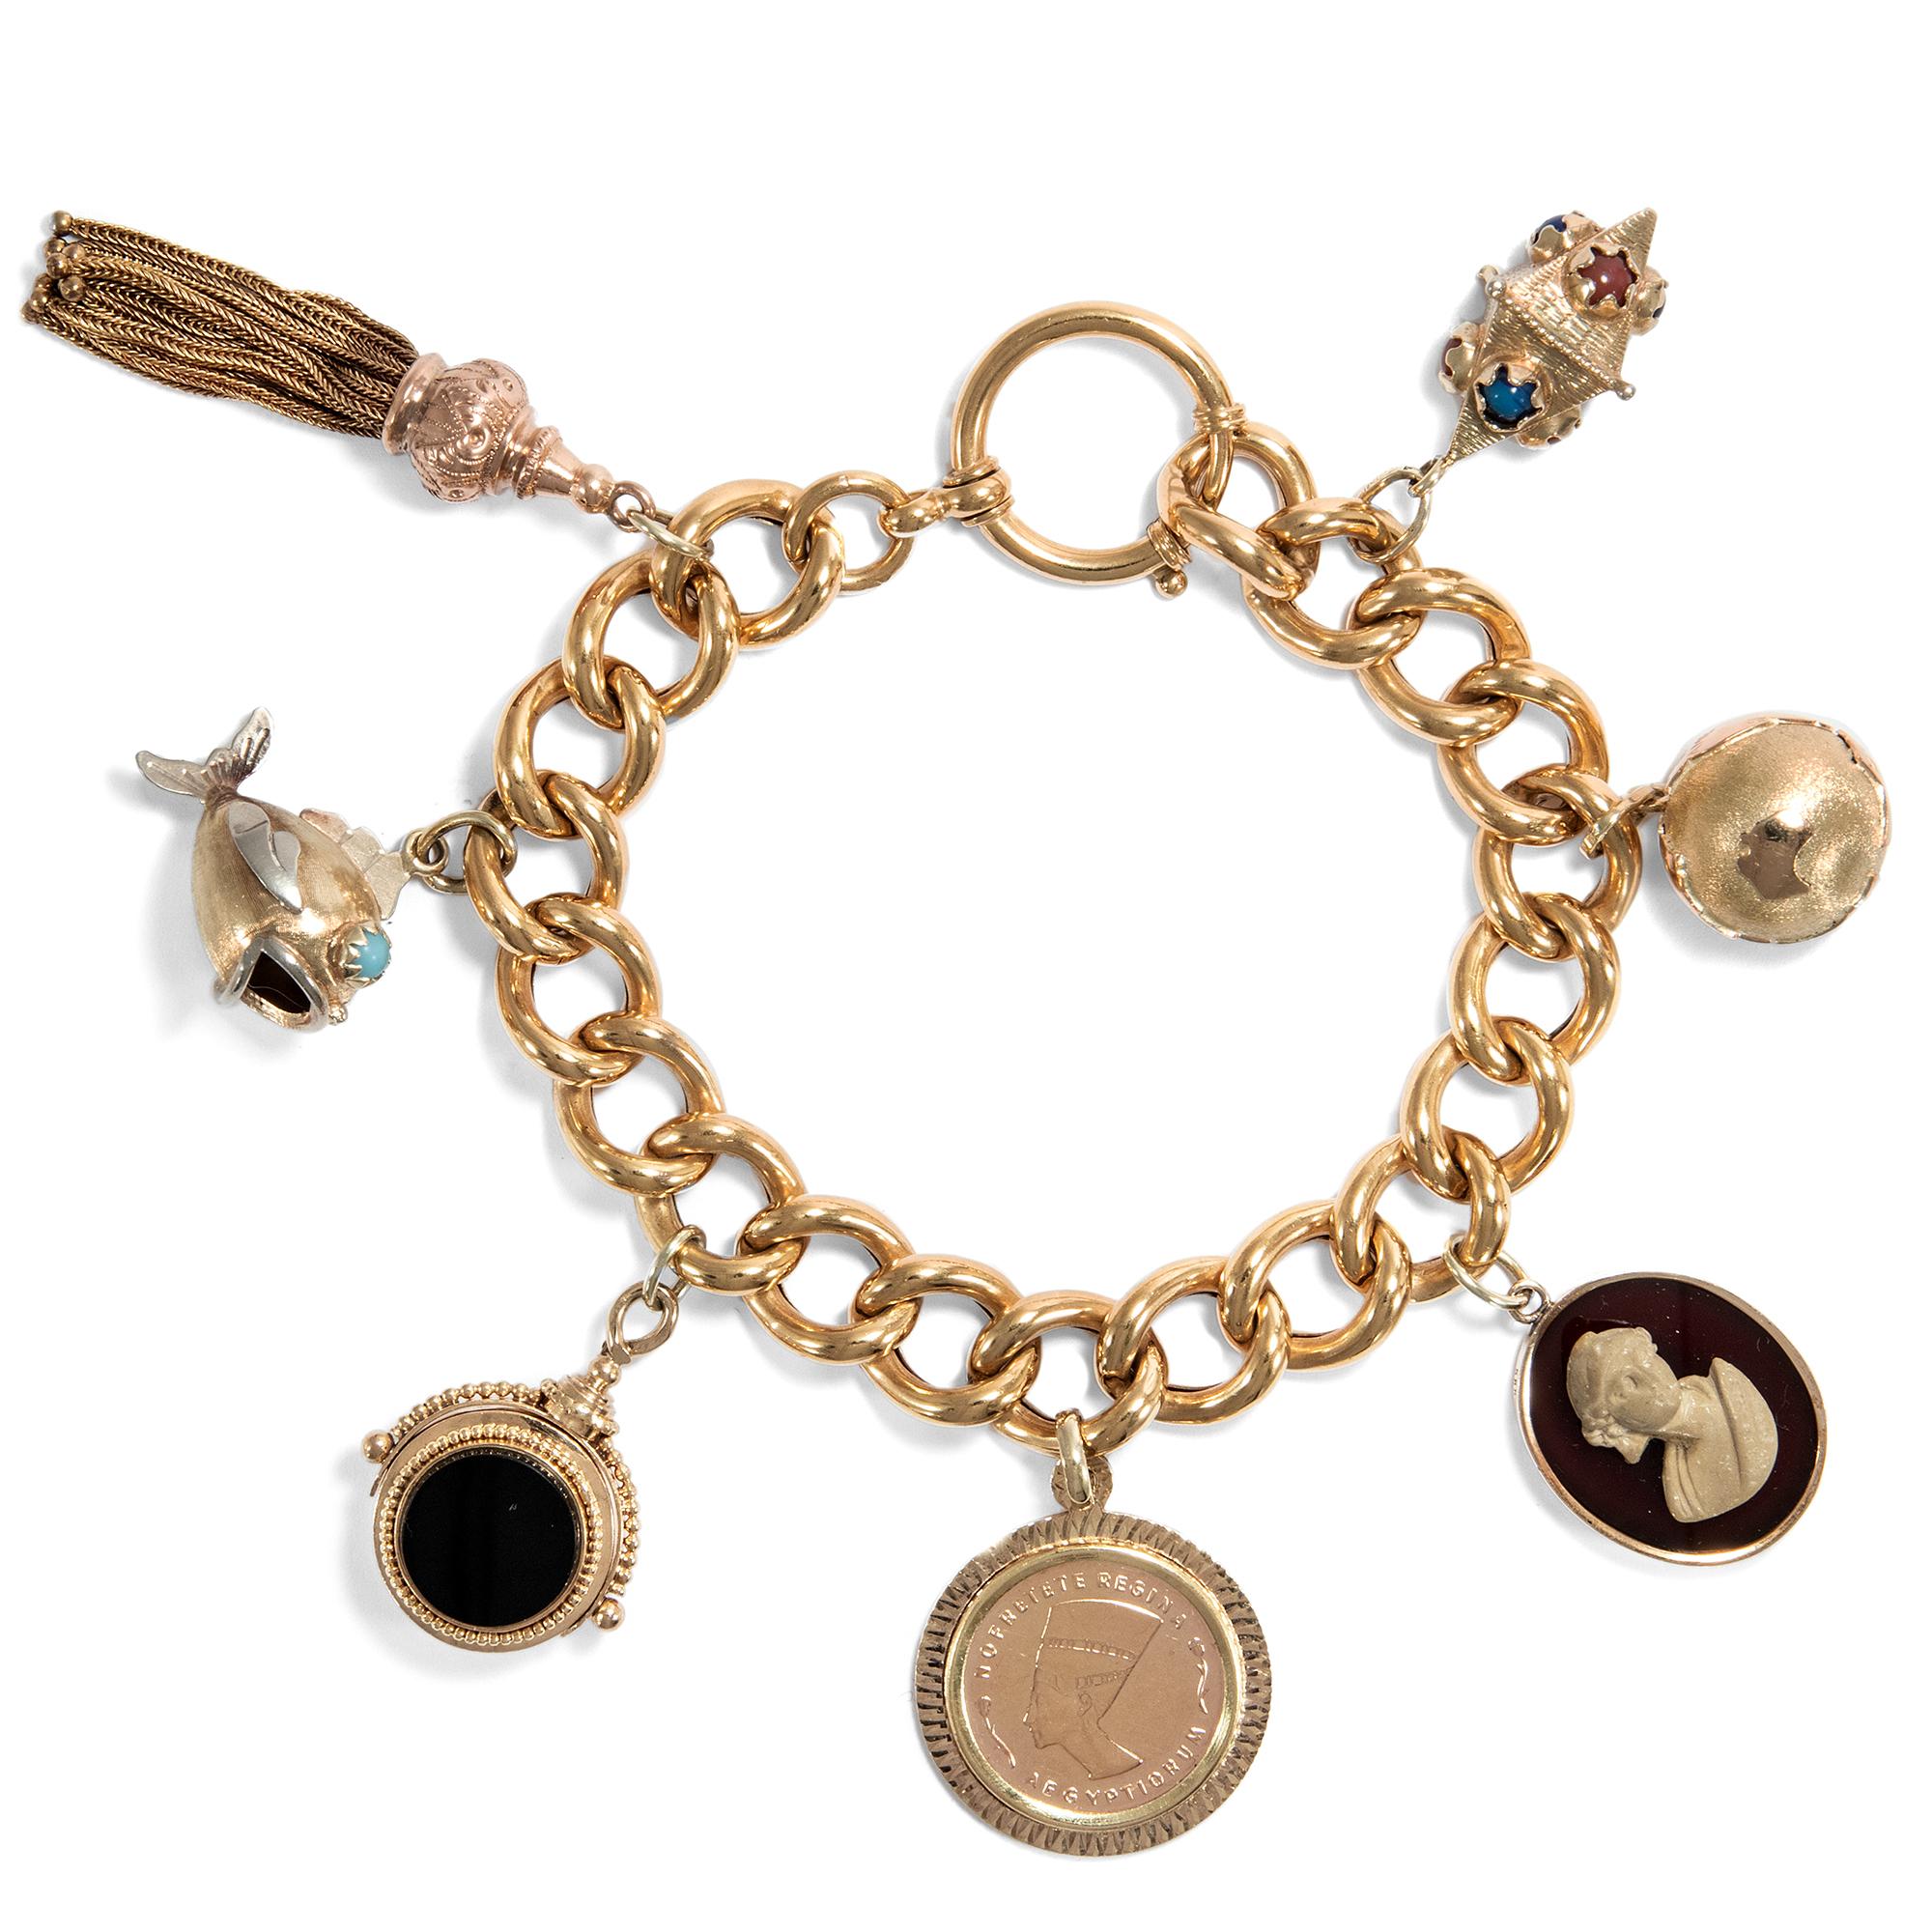 Um 1900 Antique Gold Bracelet Charm